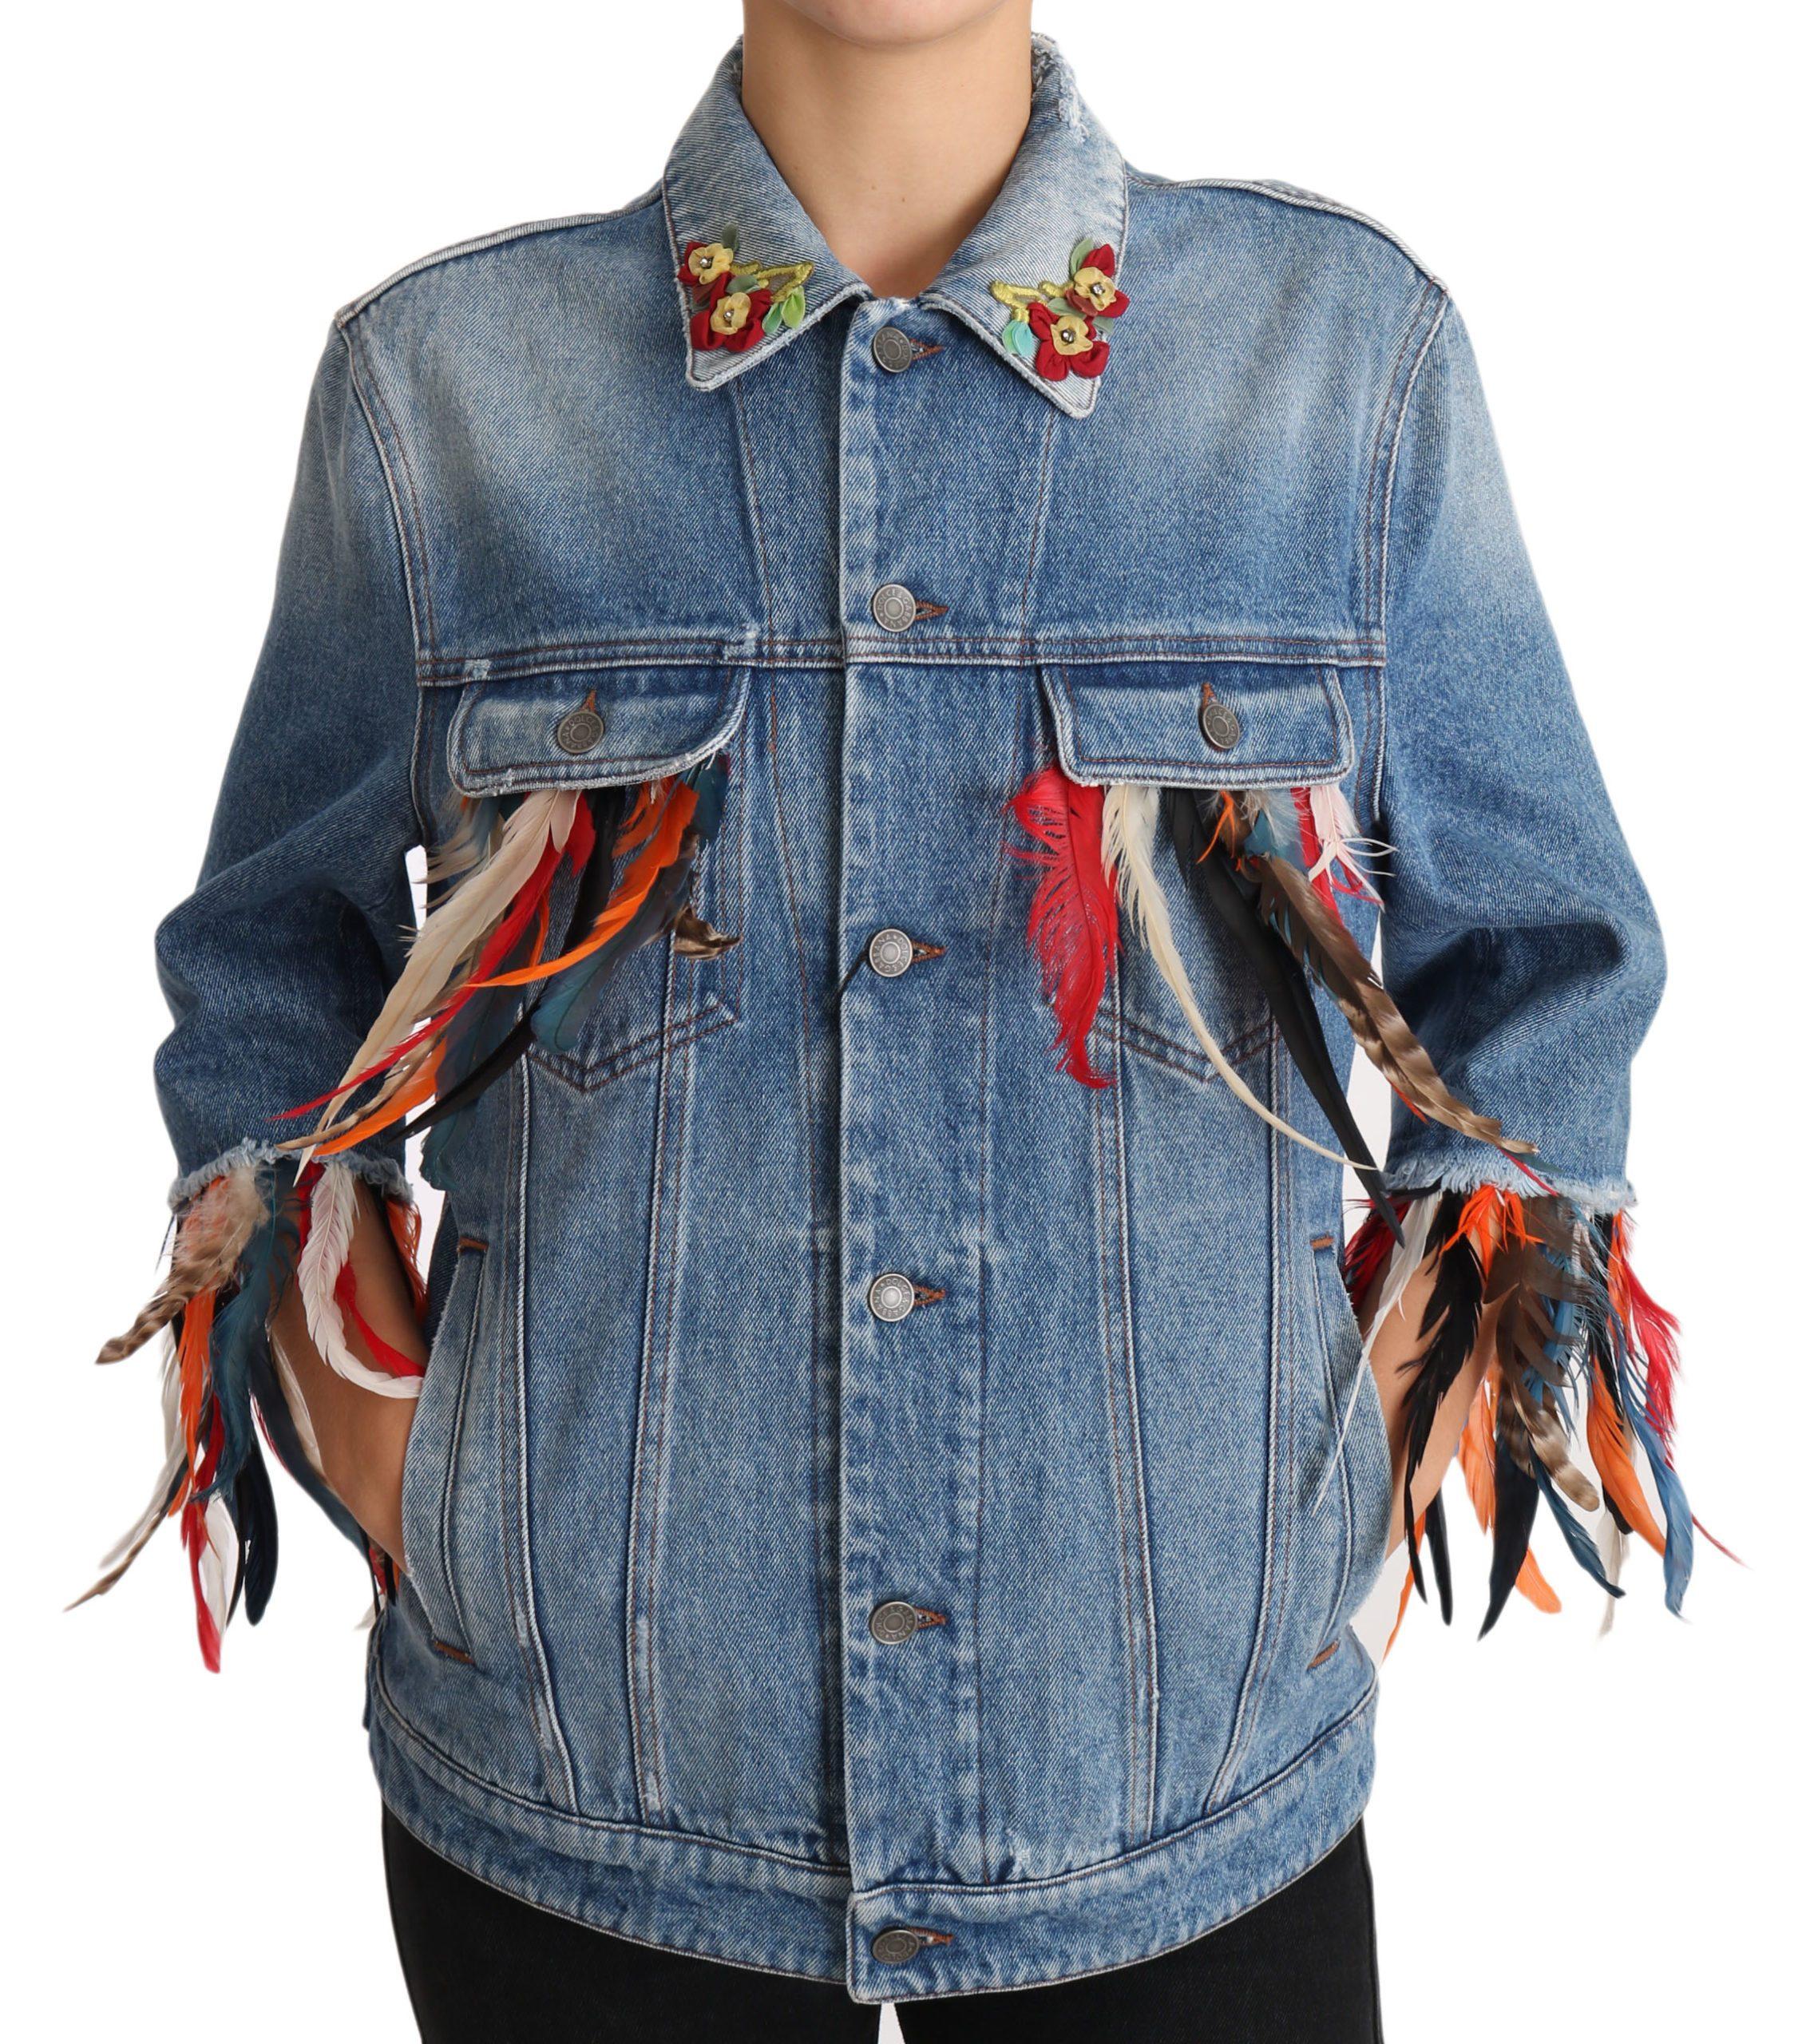 Dolce & Gabbana Women's Feather Floral Jacket Blue JKT2422 - IT44|L